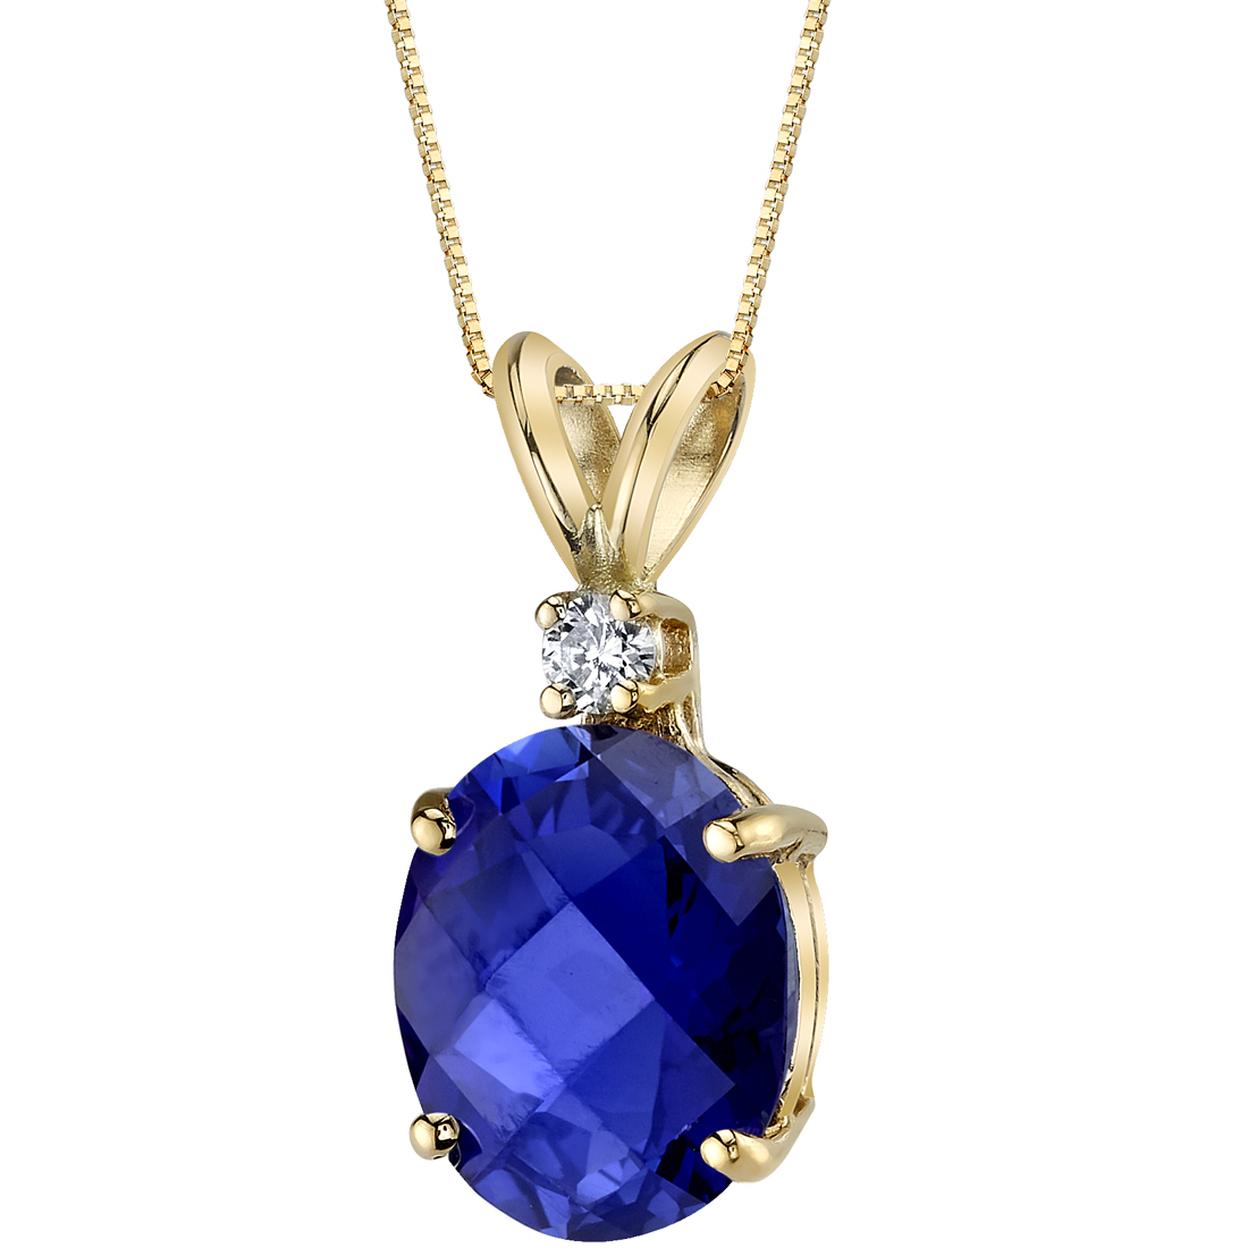 Oravo 14 Karat Yellow Gold Oval Shape 3.50 Carats Created Blue Sapphire Diamond Pendant